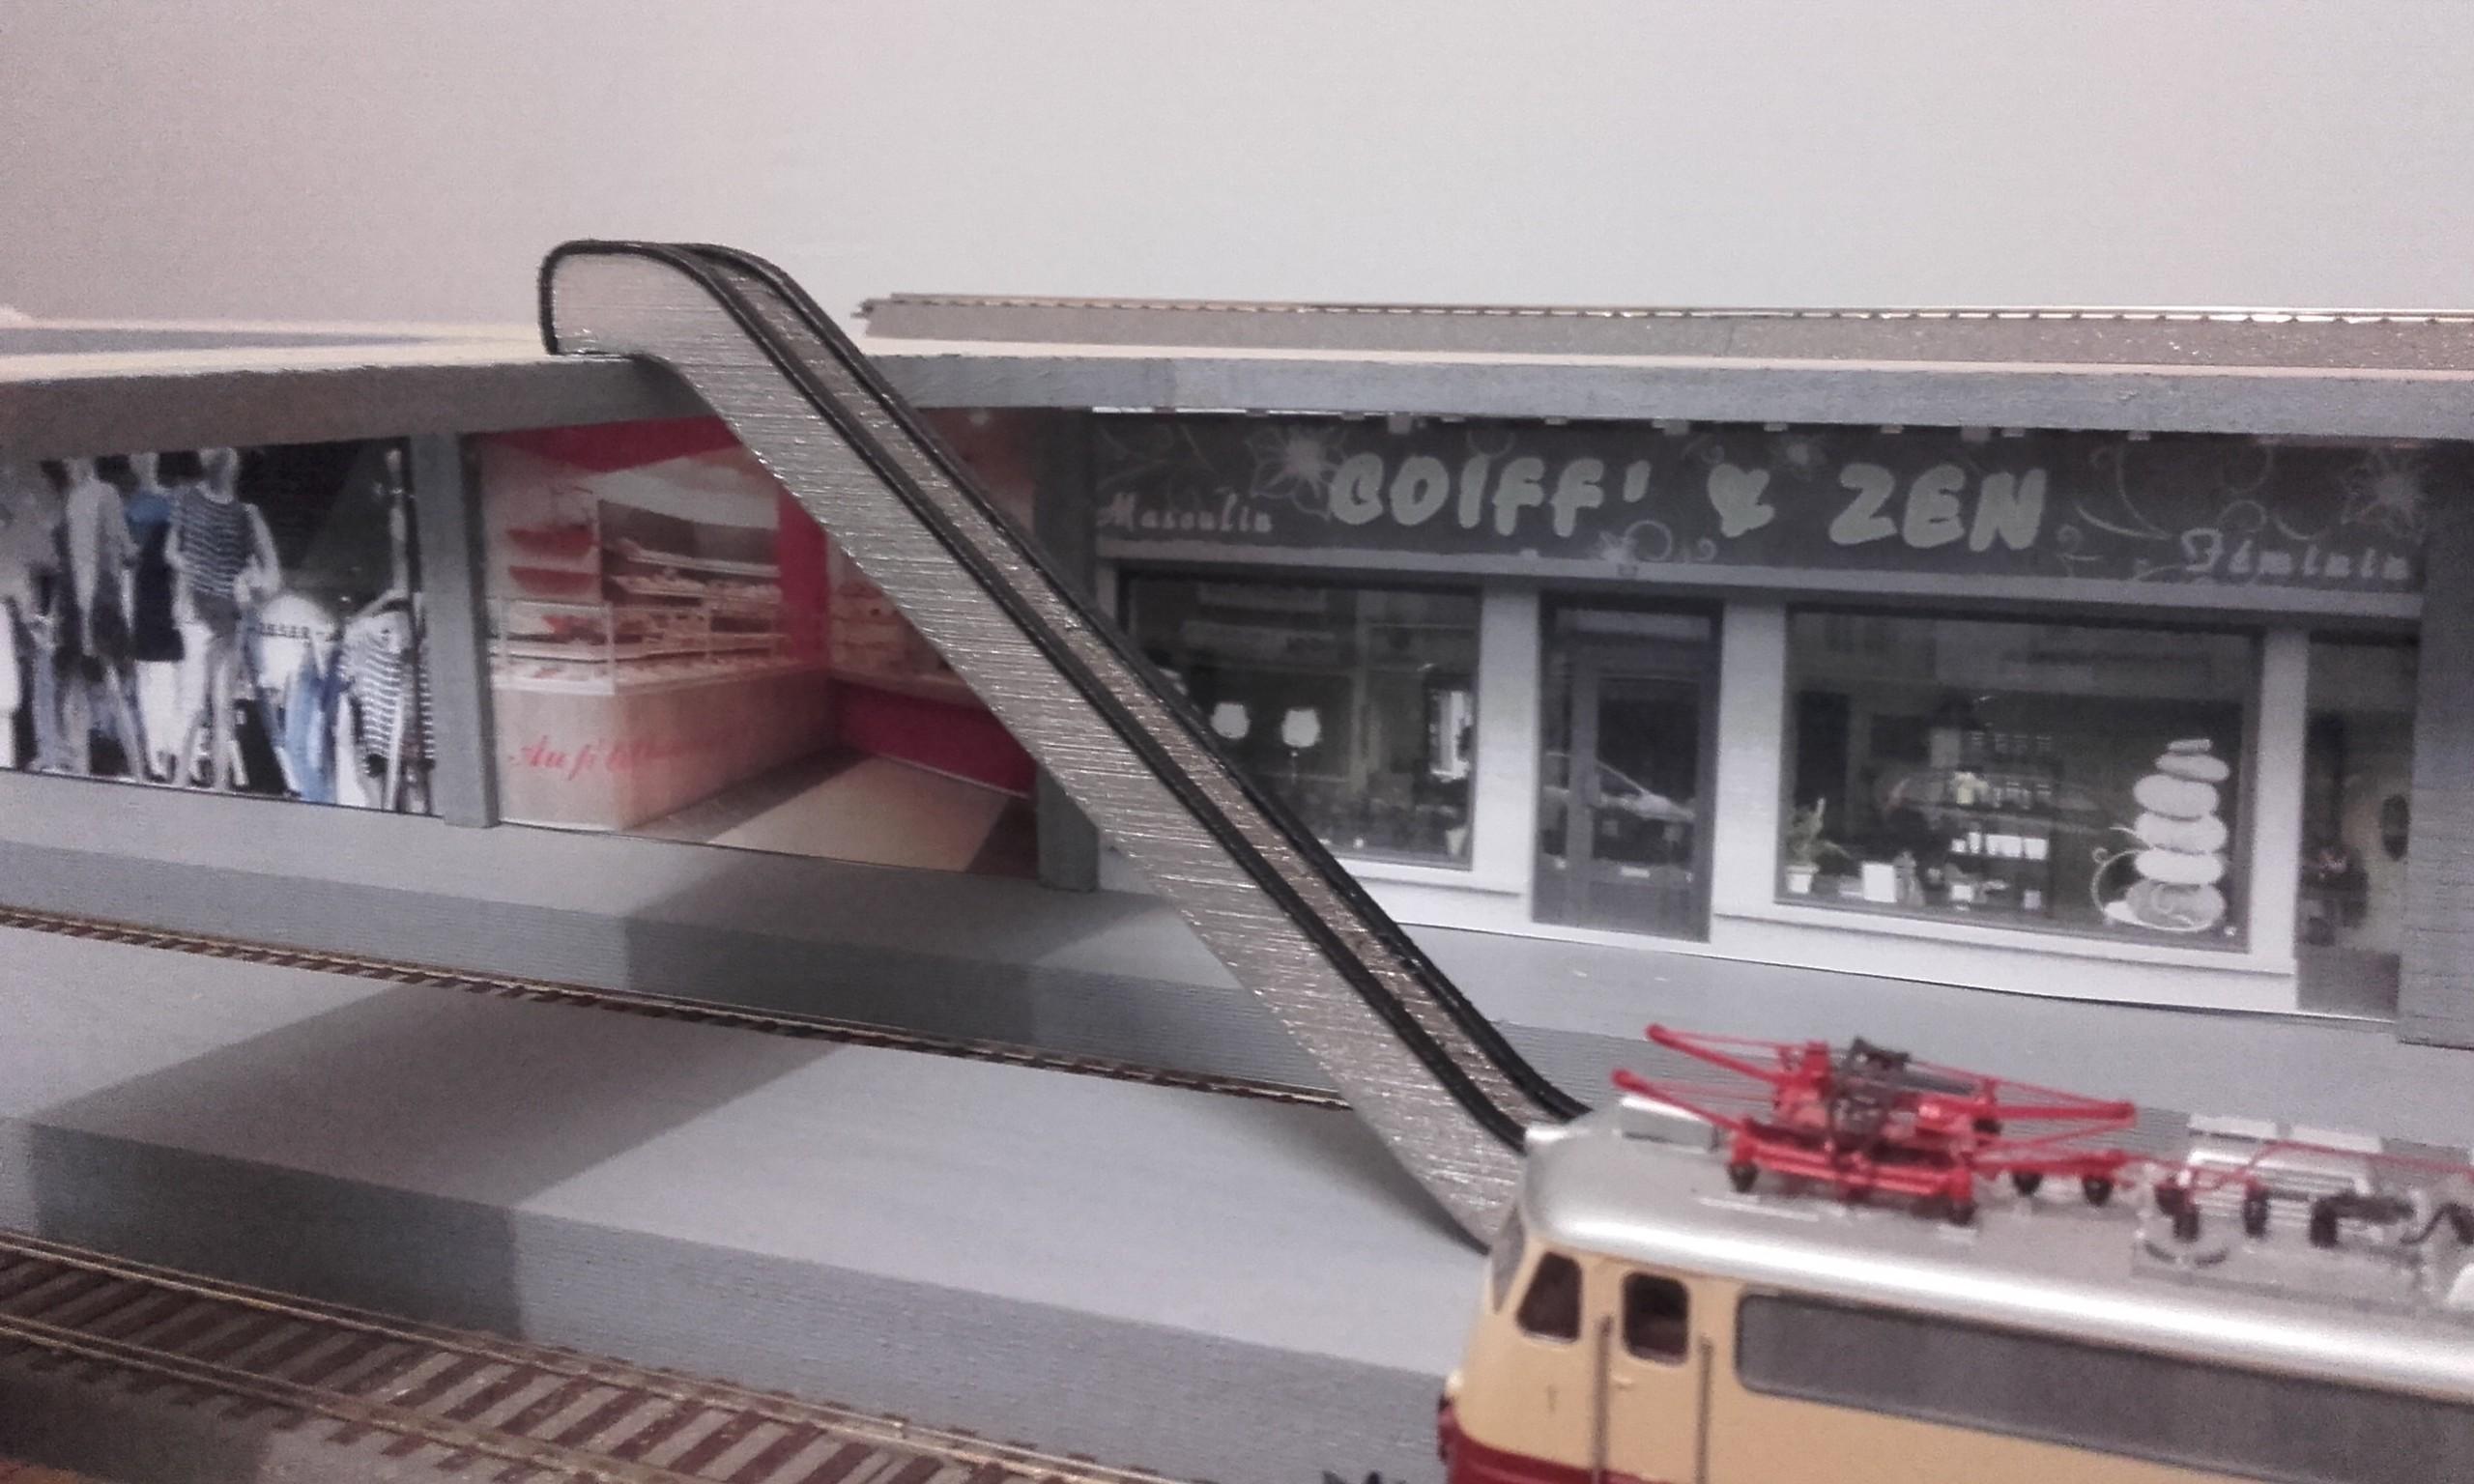 ecalator train 2.jpg Download free STL file Escalator • 3D printer design, Xertos-3d